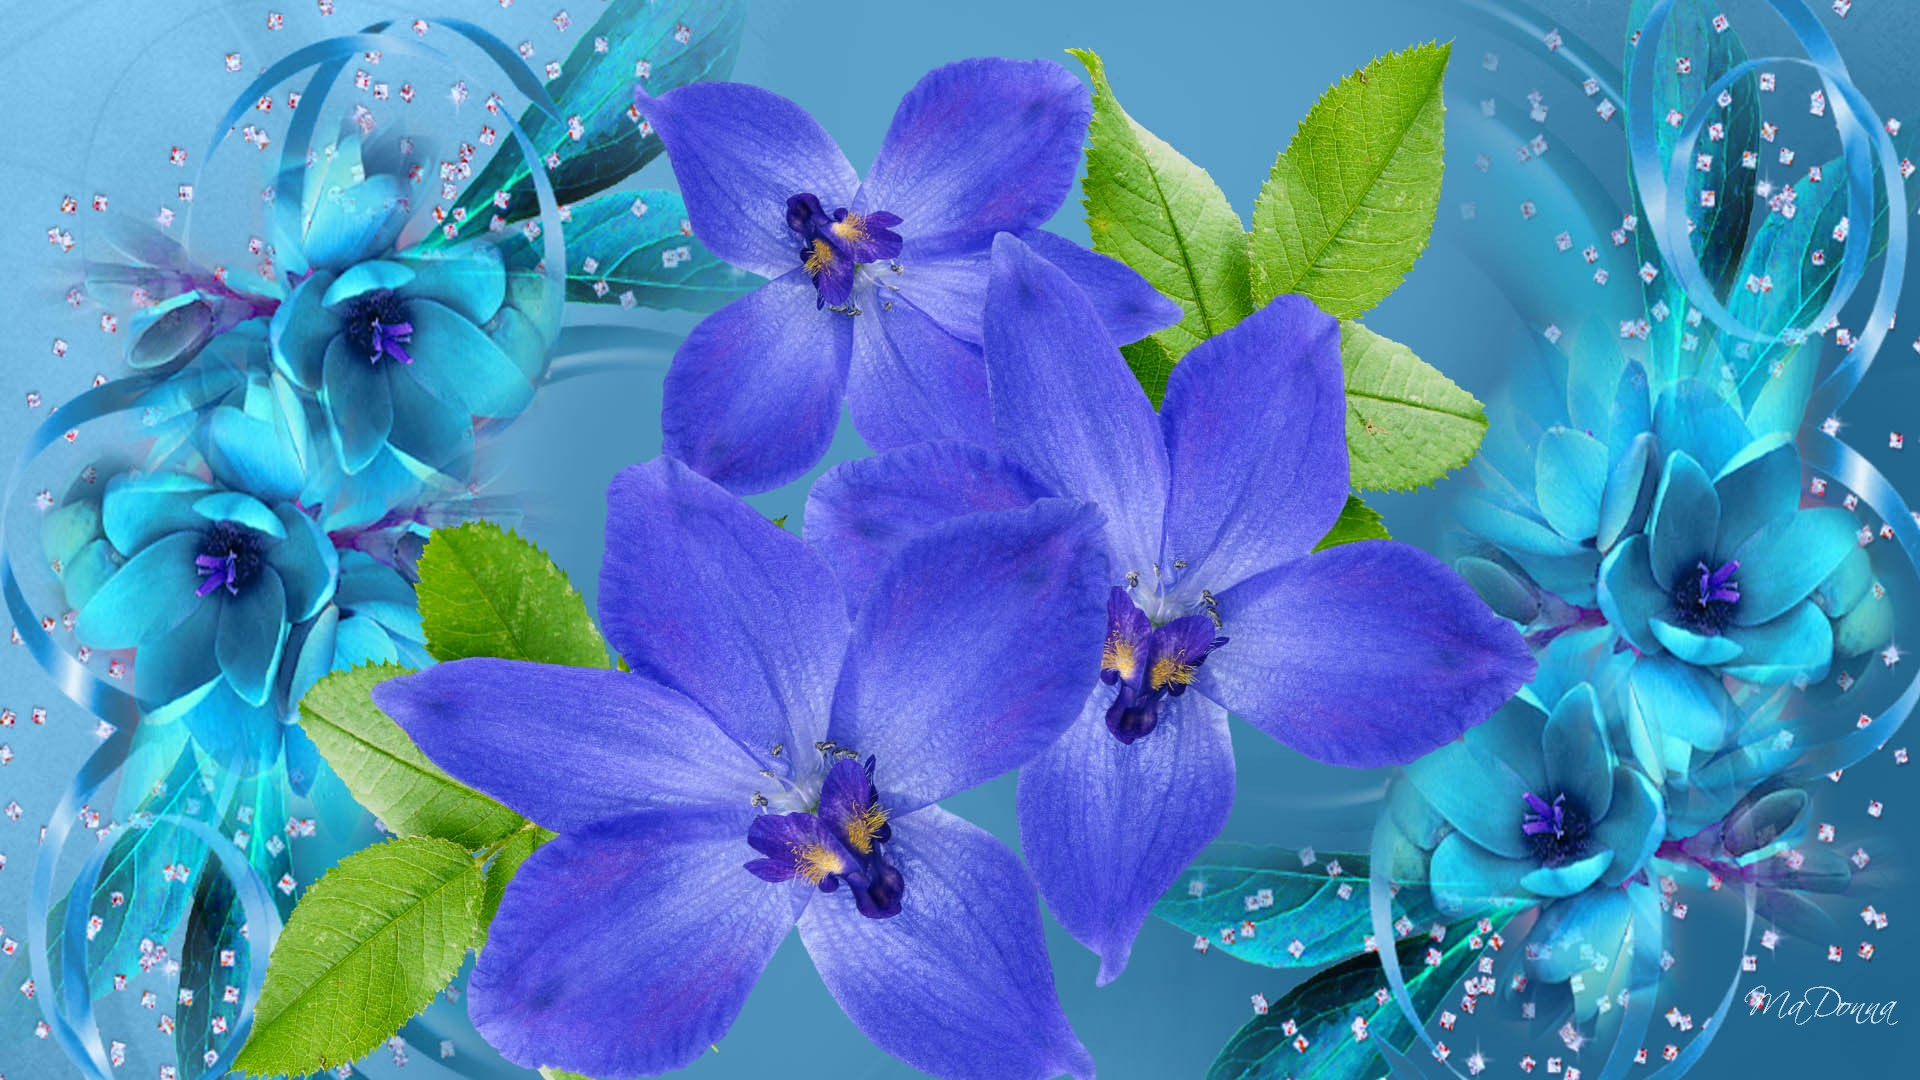 Blue spring hd wallpaper background image 1920x1080 id834740 wallpapers id834740 izmirmasajfo